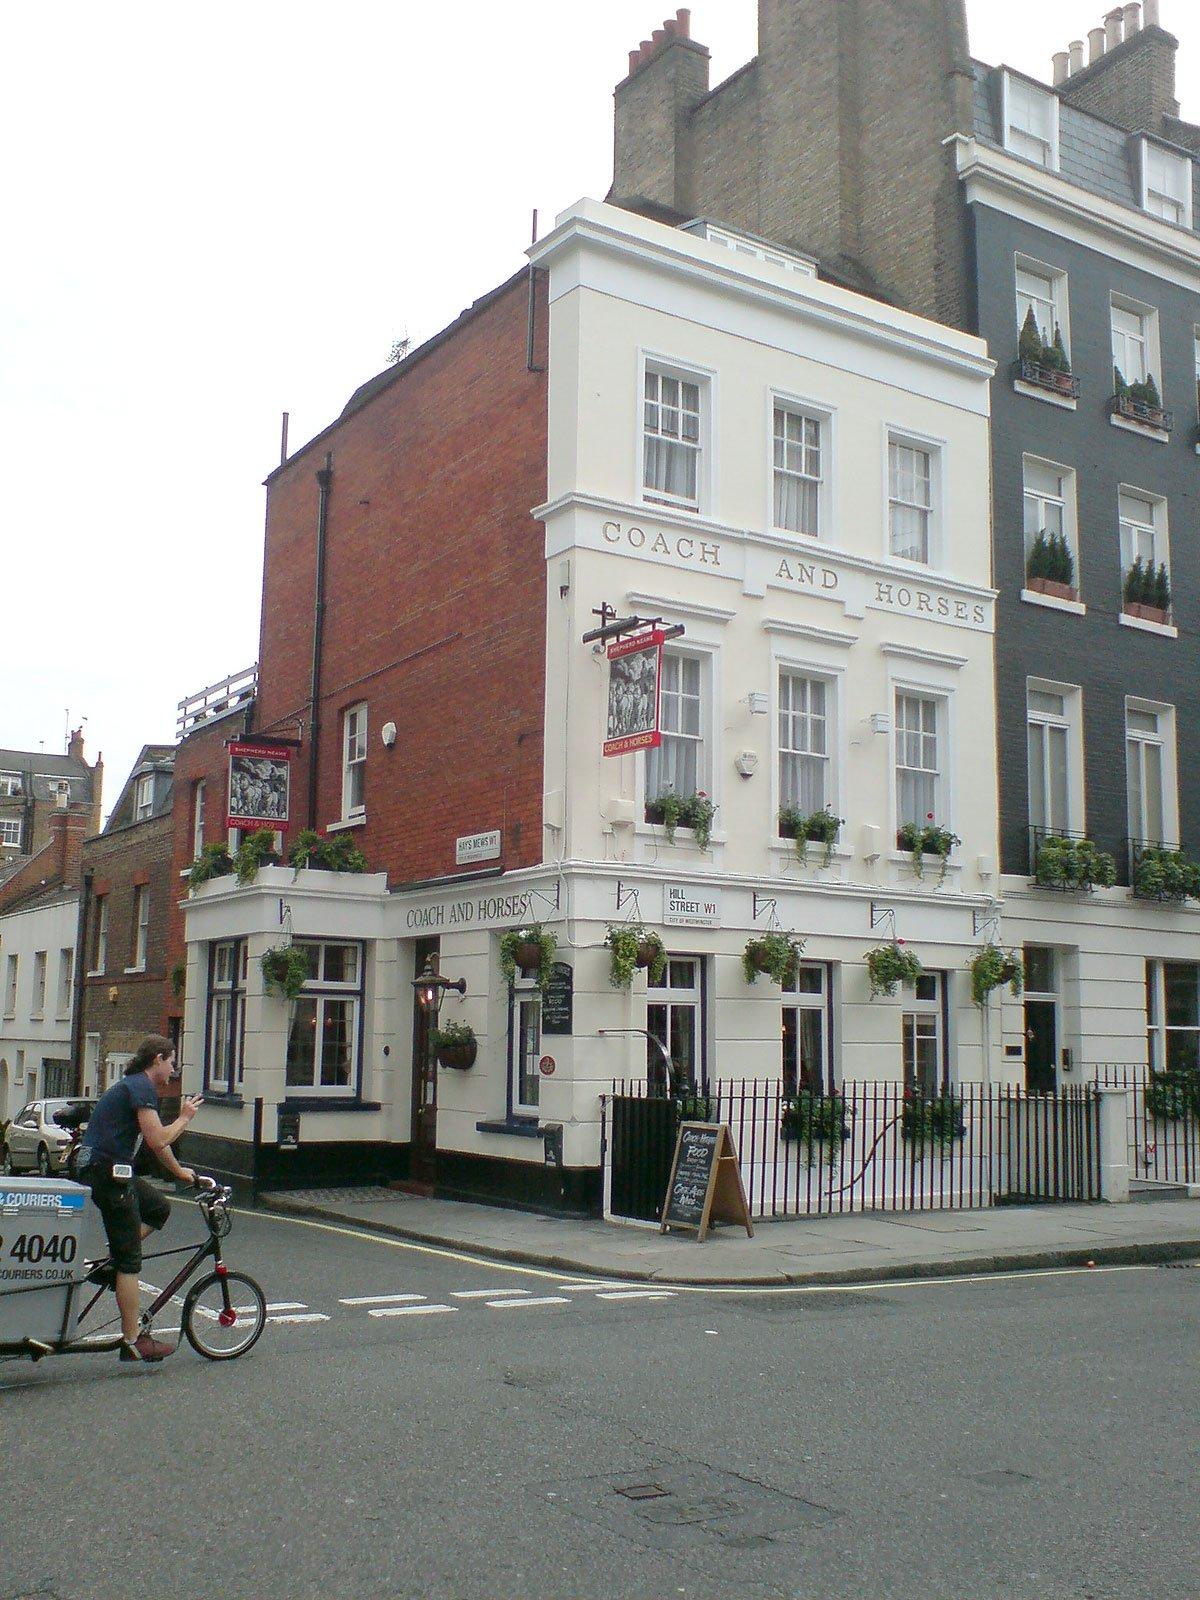 The Coach and Horses Mayfair London Pub Reviewb - The Coach and Horses (b), Mayfair, London - Pub Review